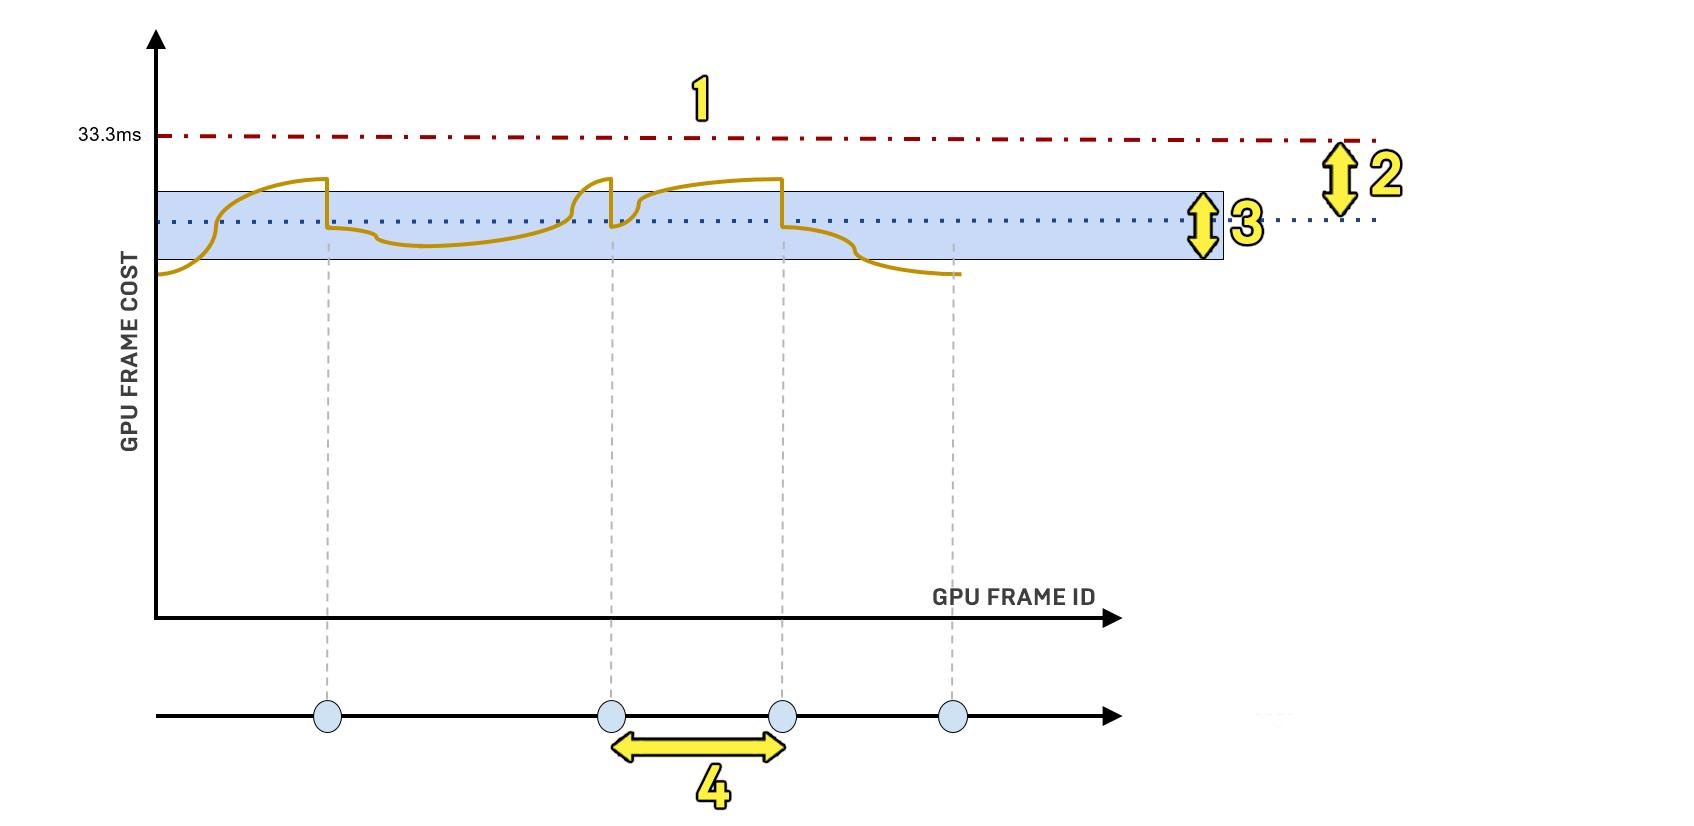 graphique GPU des frames